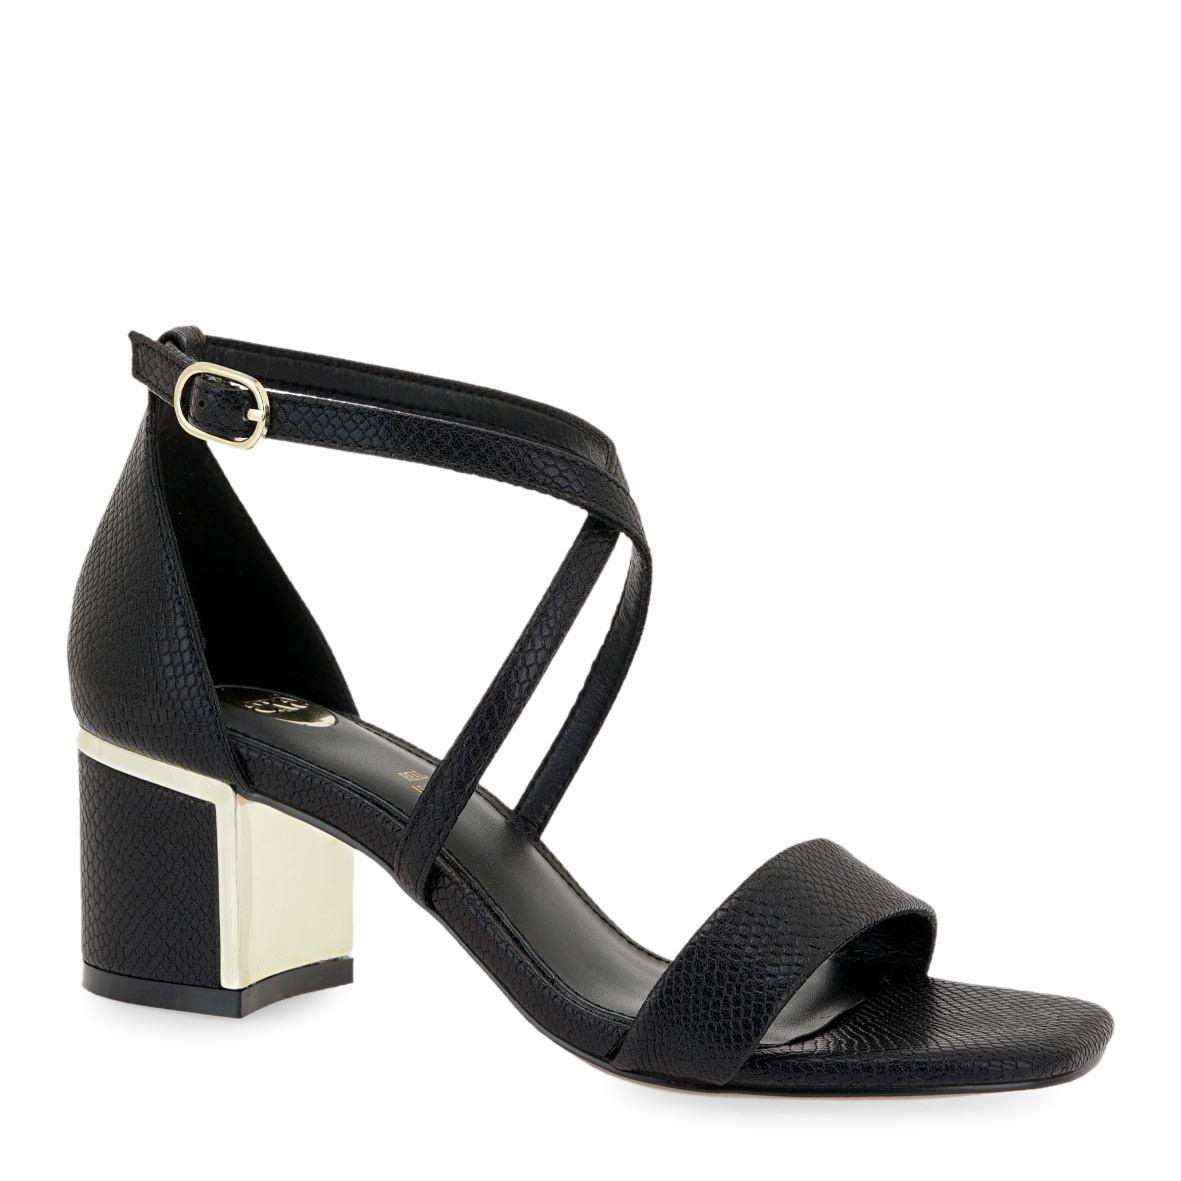 EXE Shoes Πέδιλα Γυναικεία ISABEL-560 Μαύρο Φίδι K47005603006